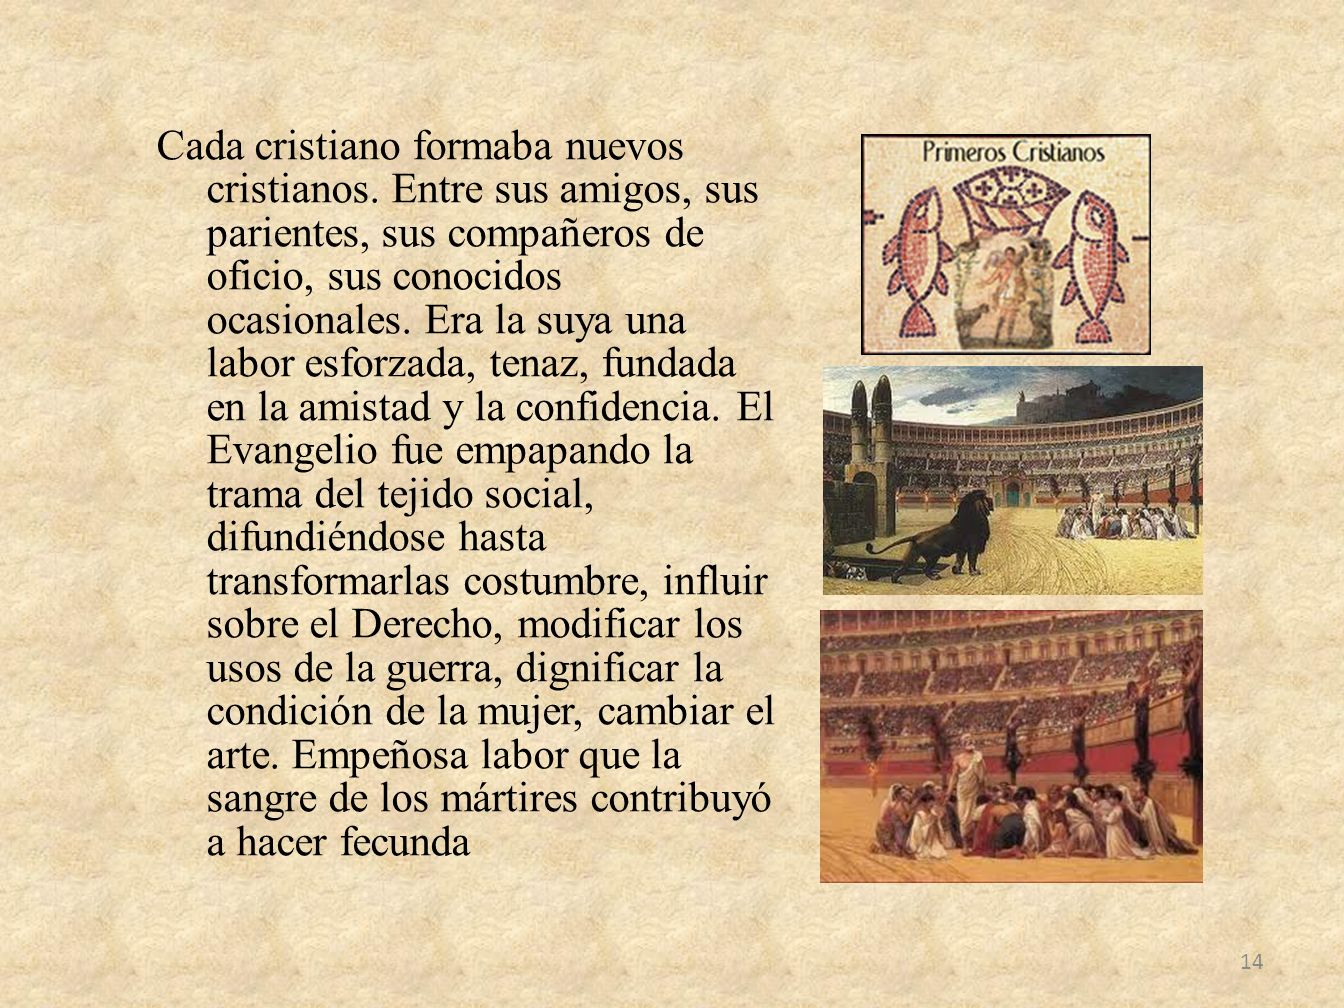 Cada cristiano formaba nuevos cristianos